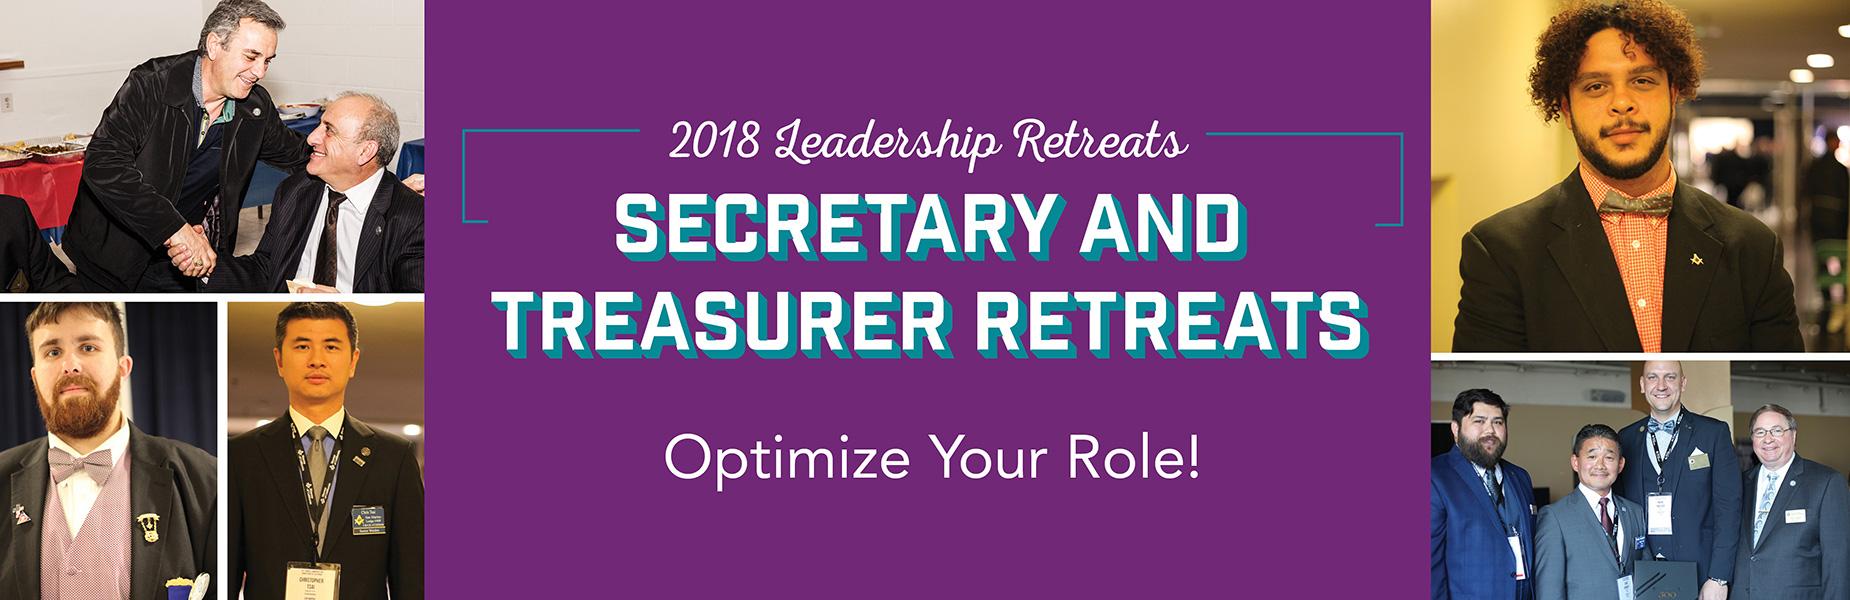 2018 Secretary and Treasurer Retreat